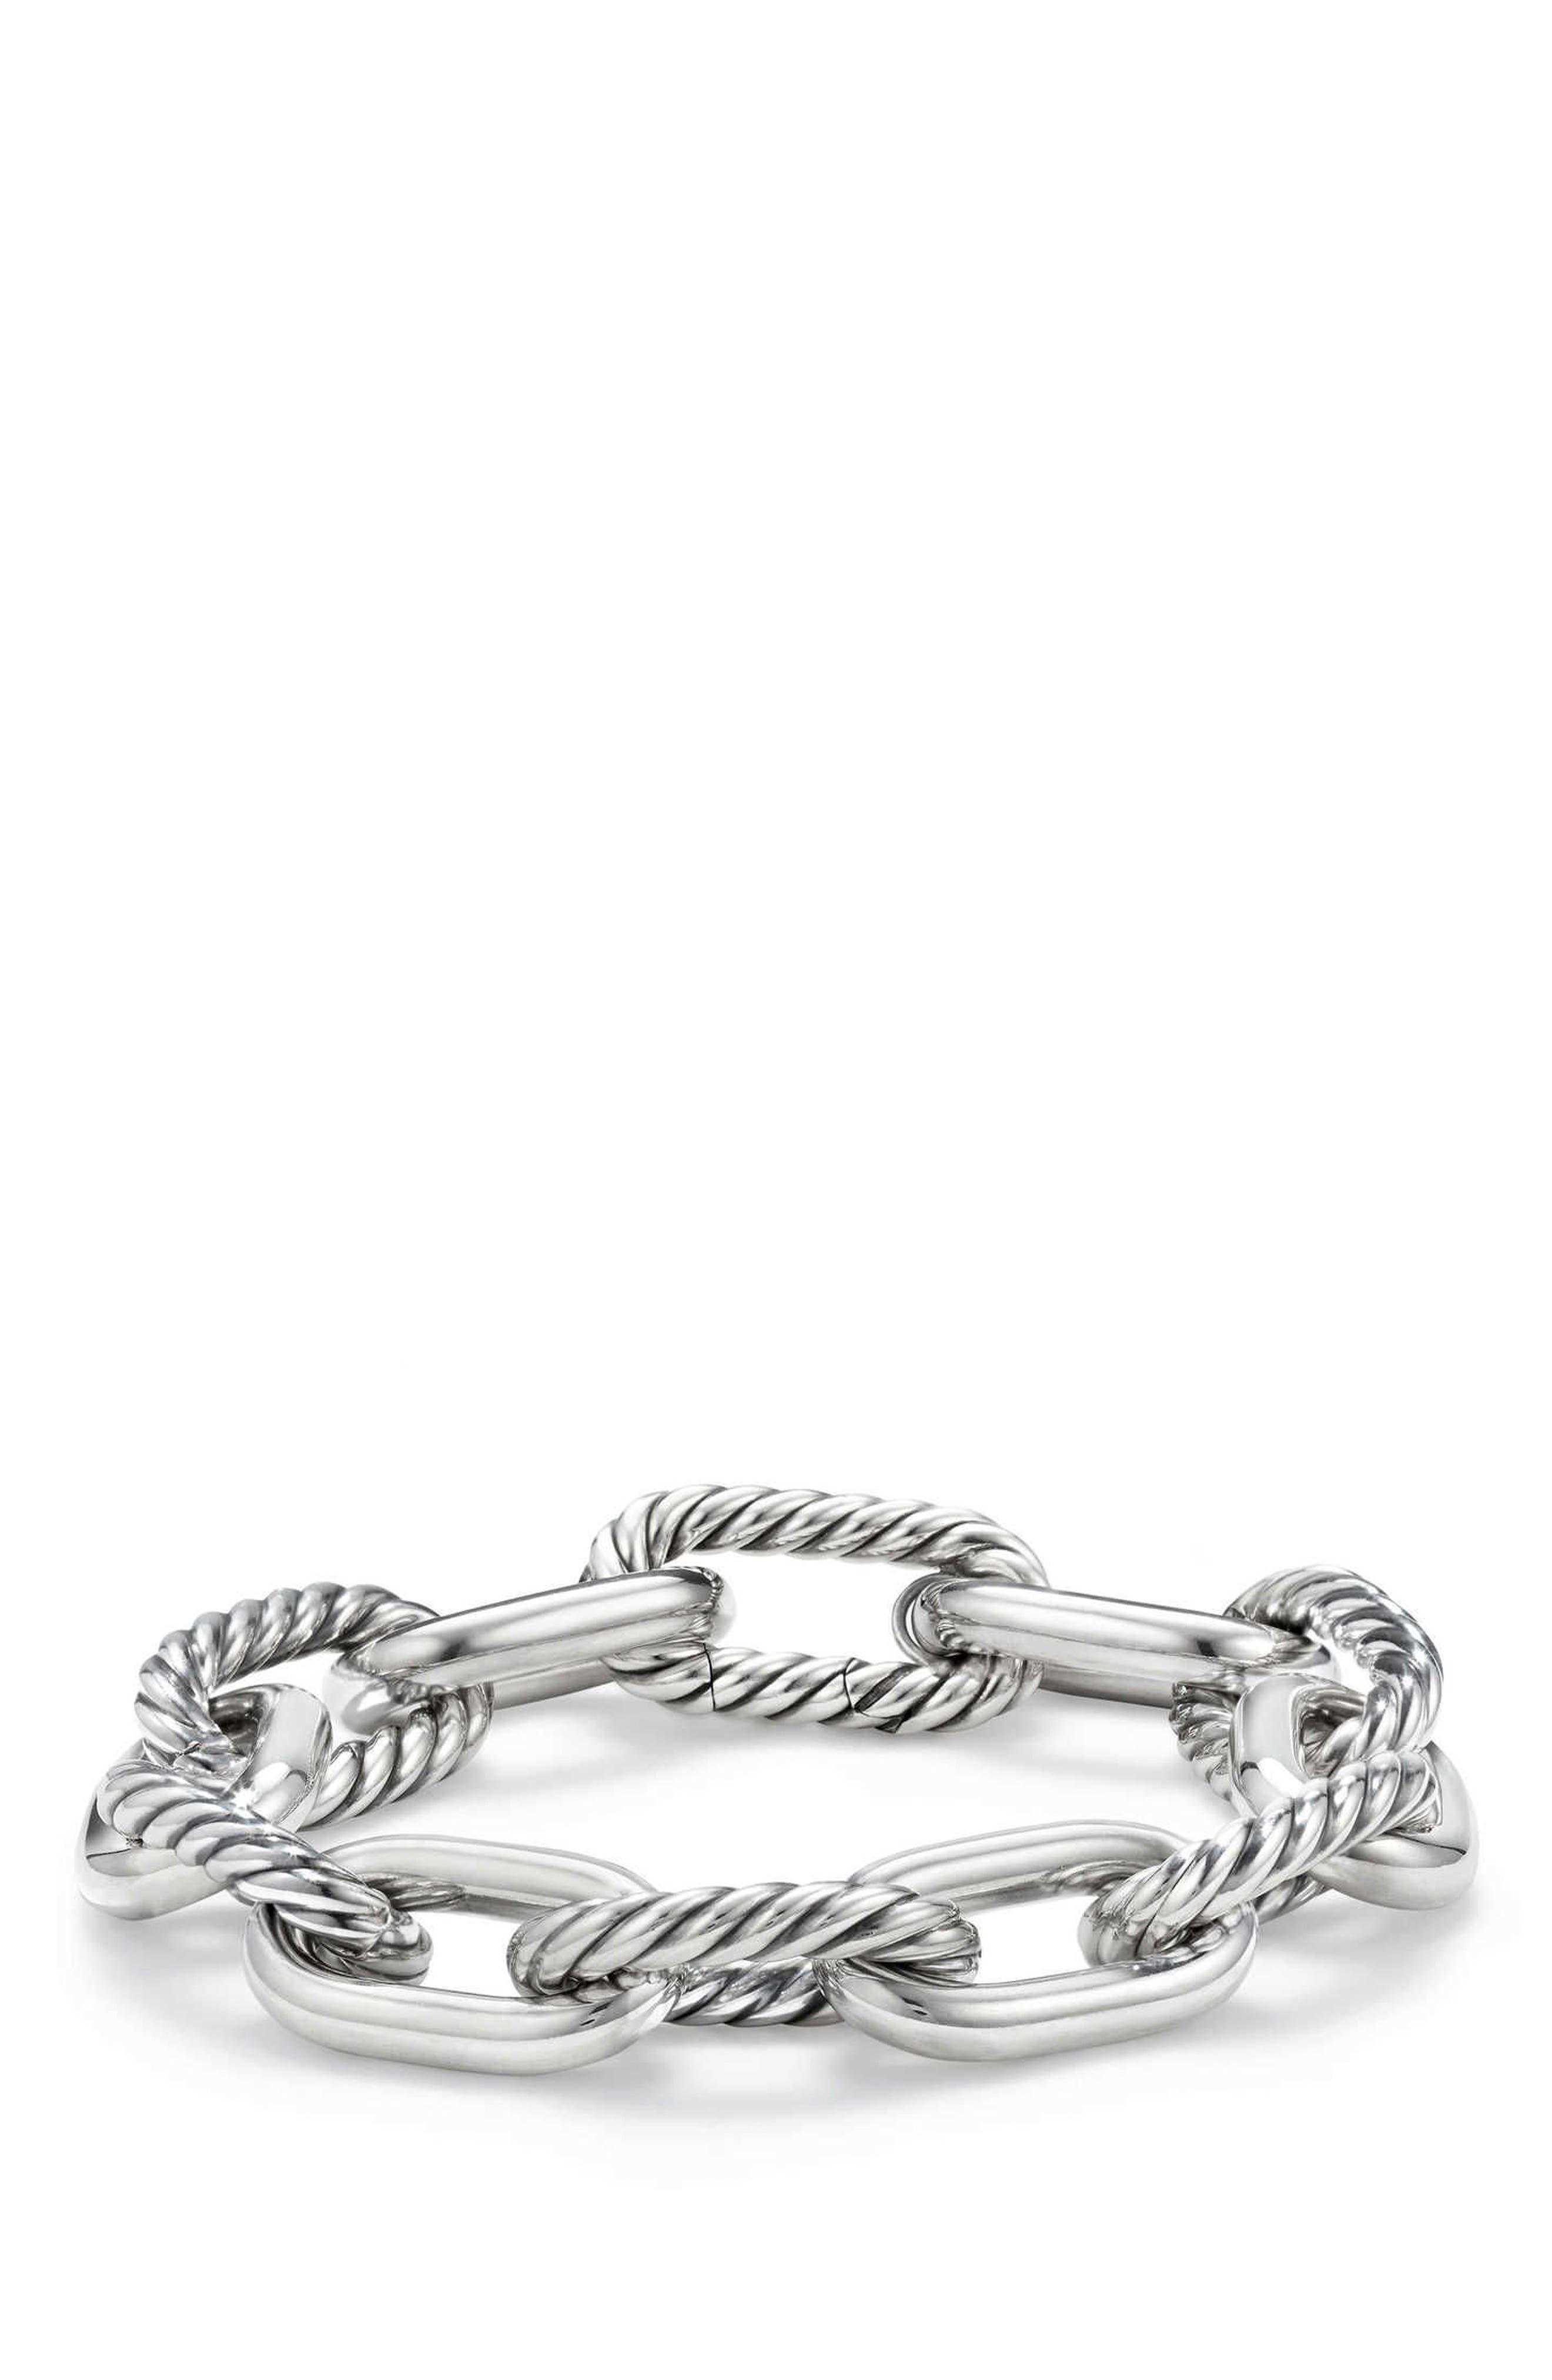 Main Image - David Yurman DY Madison Chain Large Bracelet